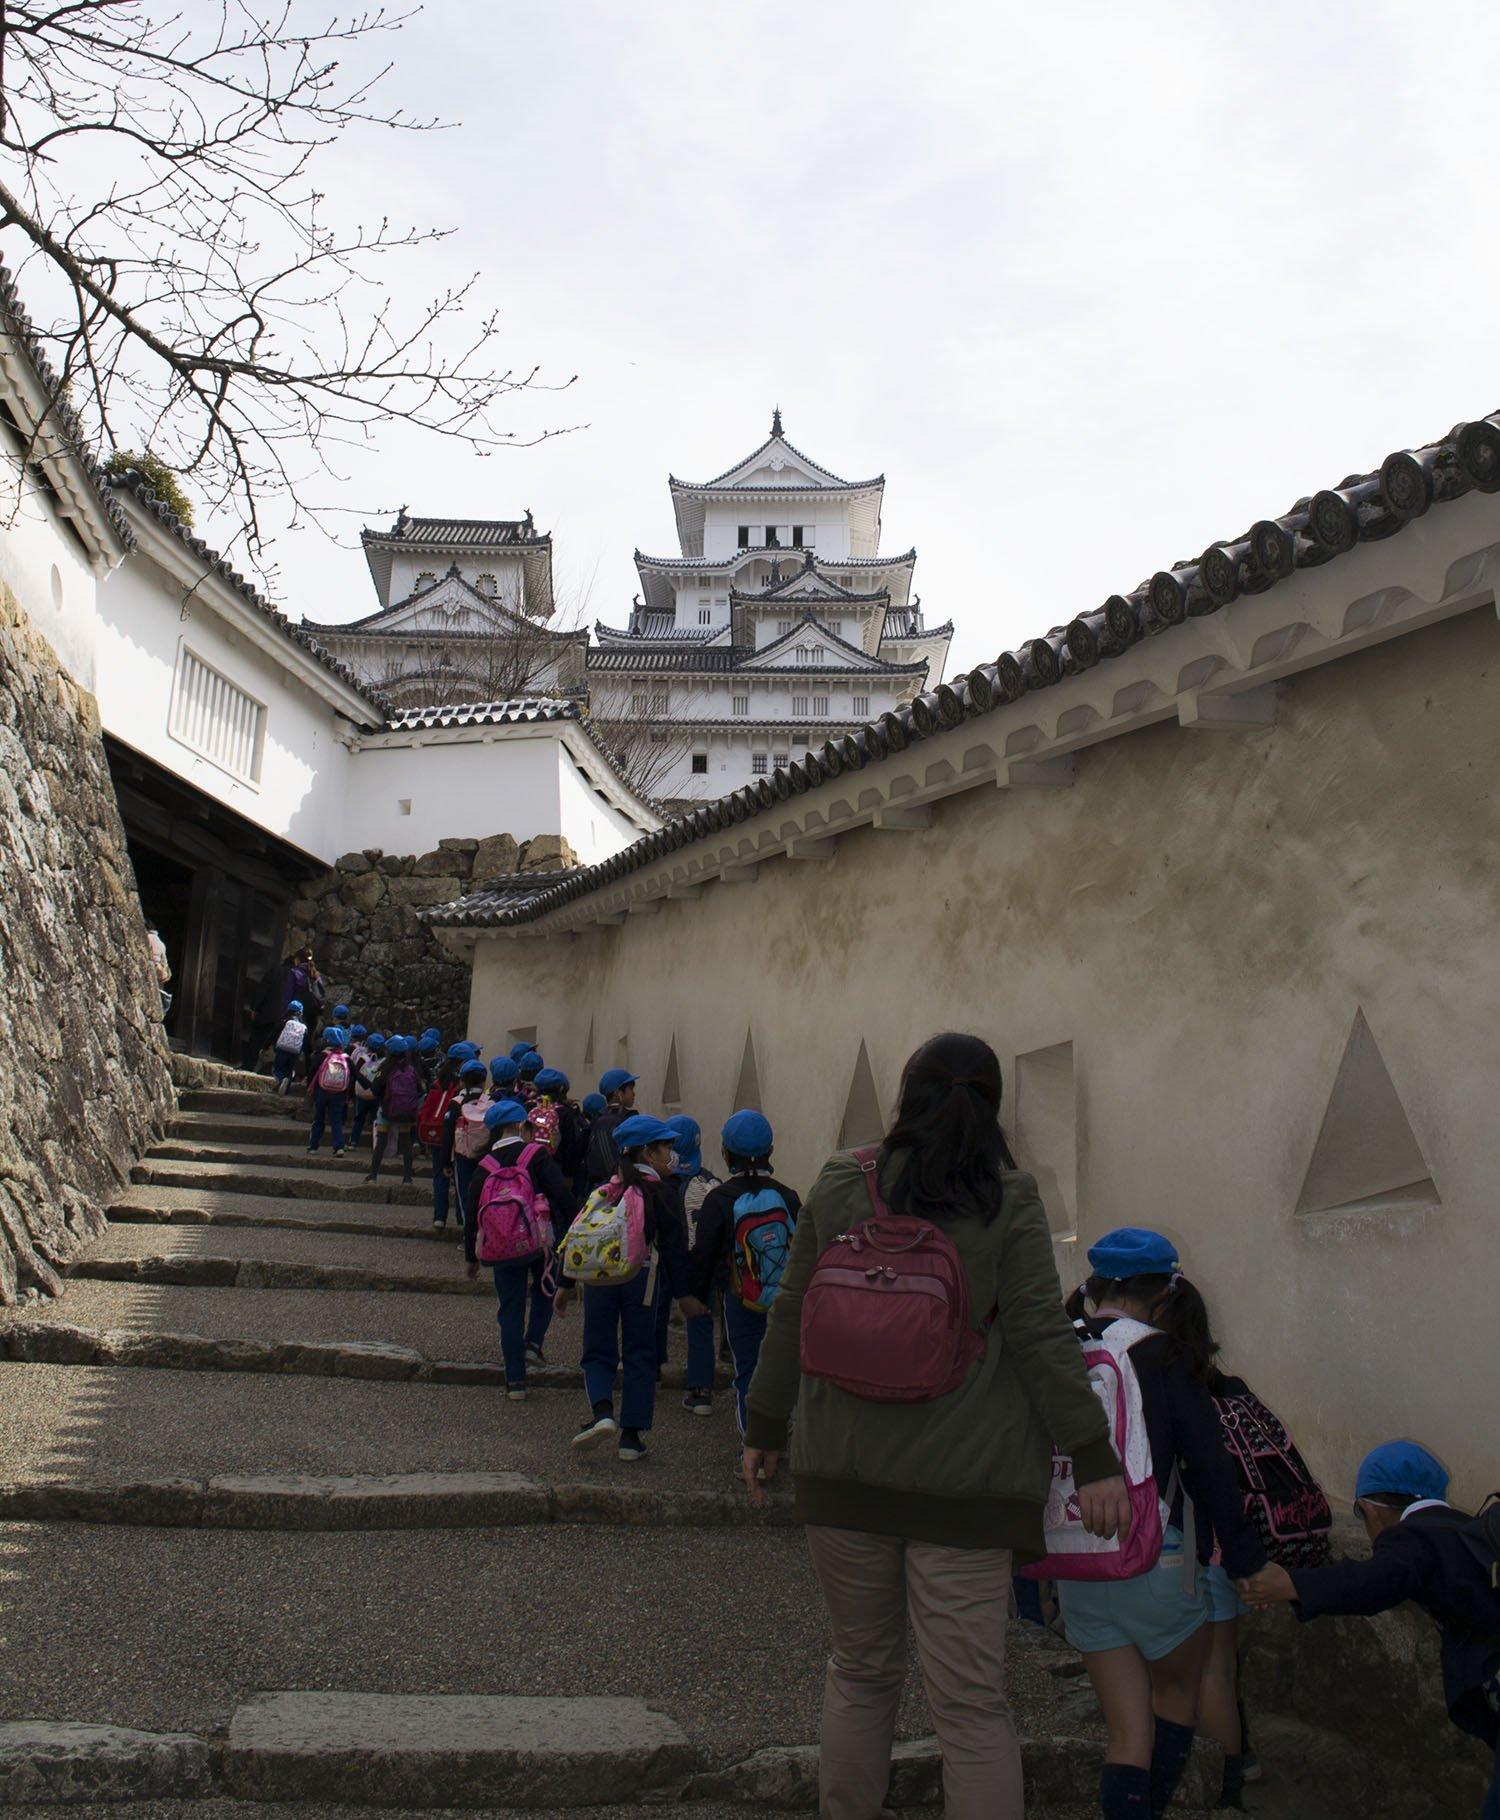 Pasillos del Castillo de Himeji